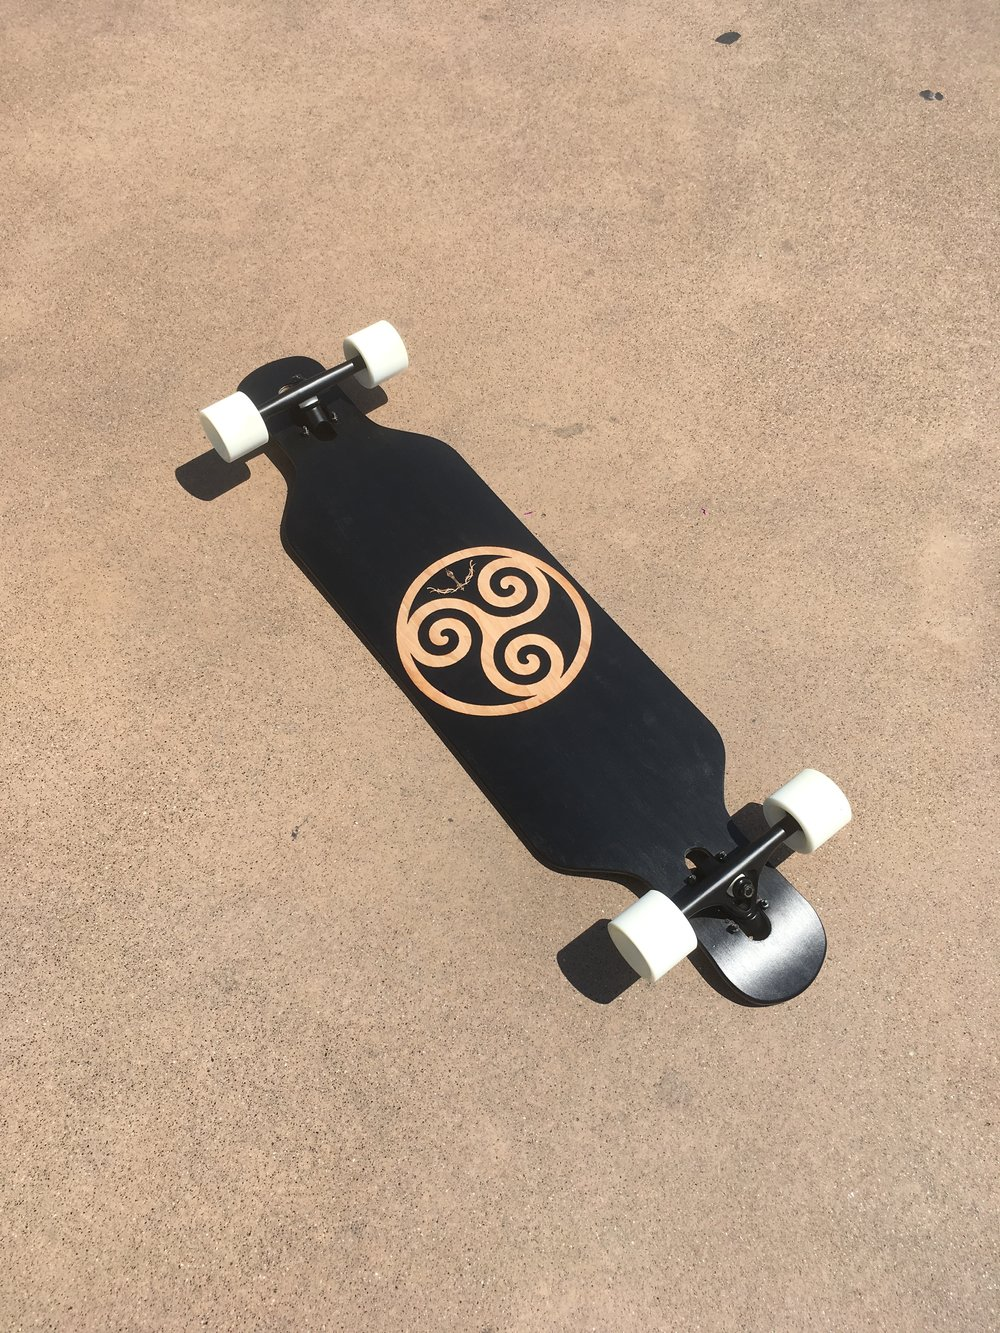 Longboard custom complete